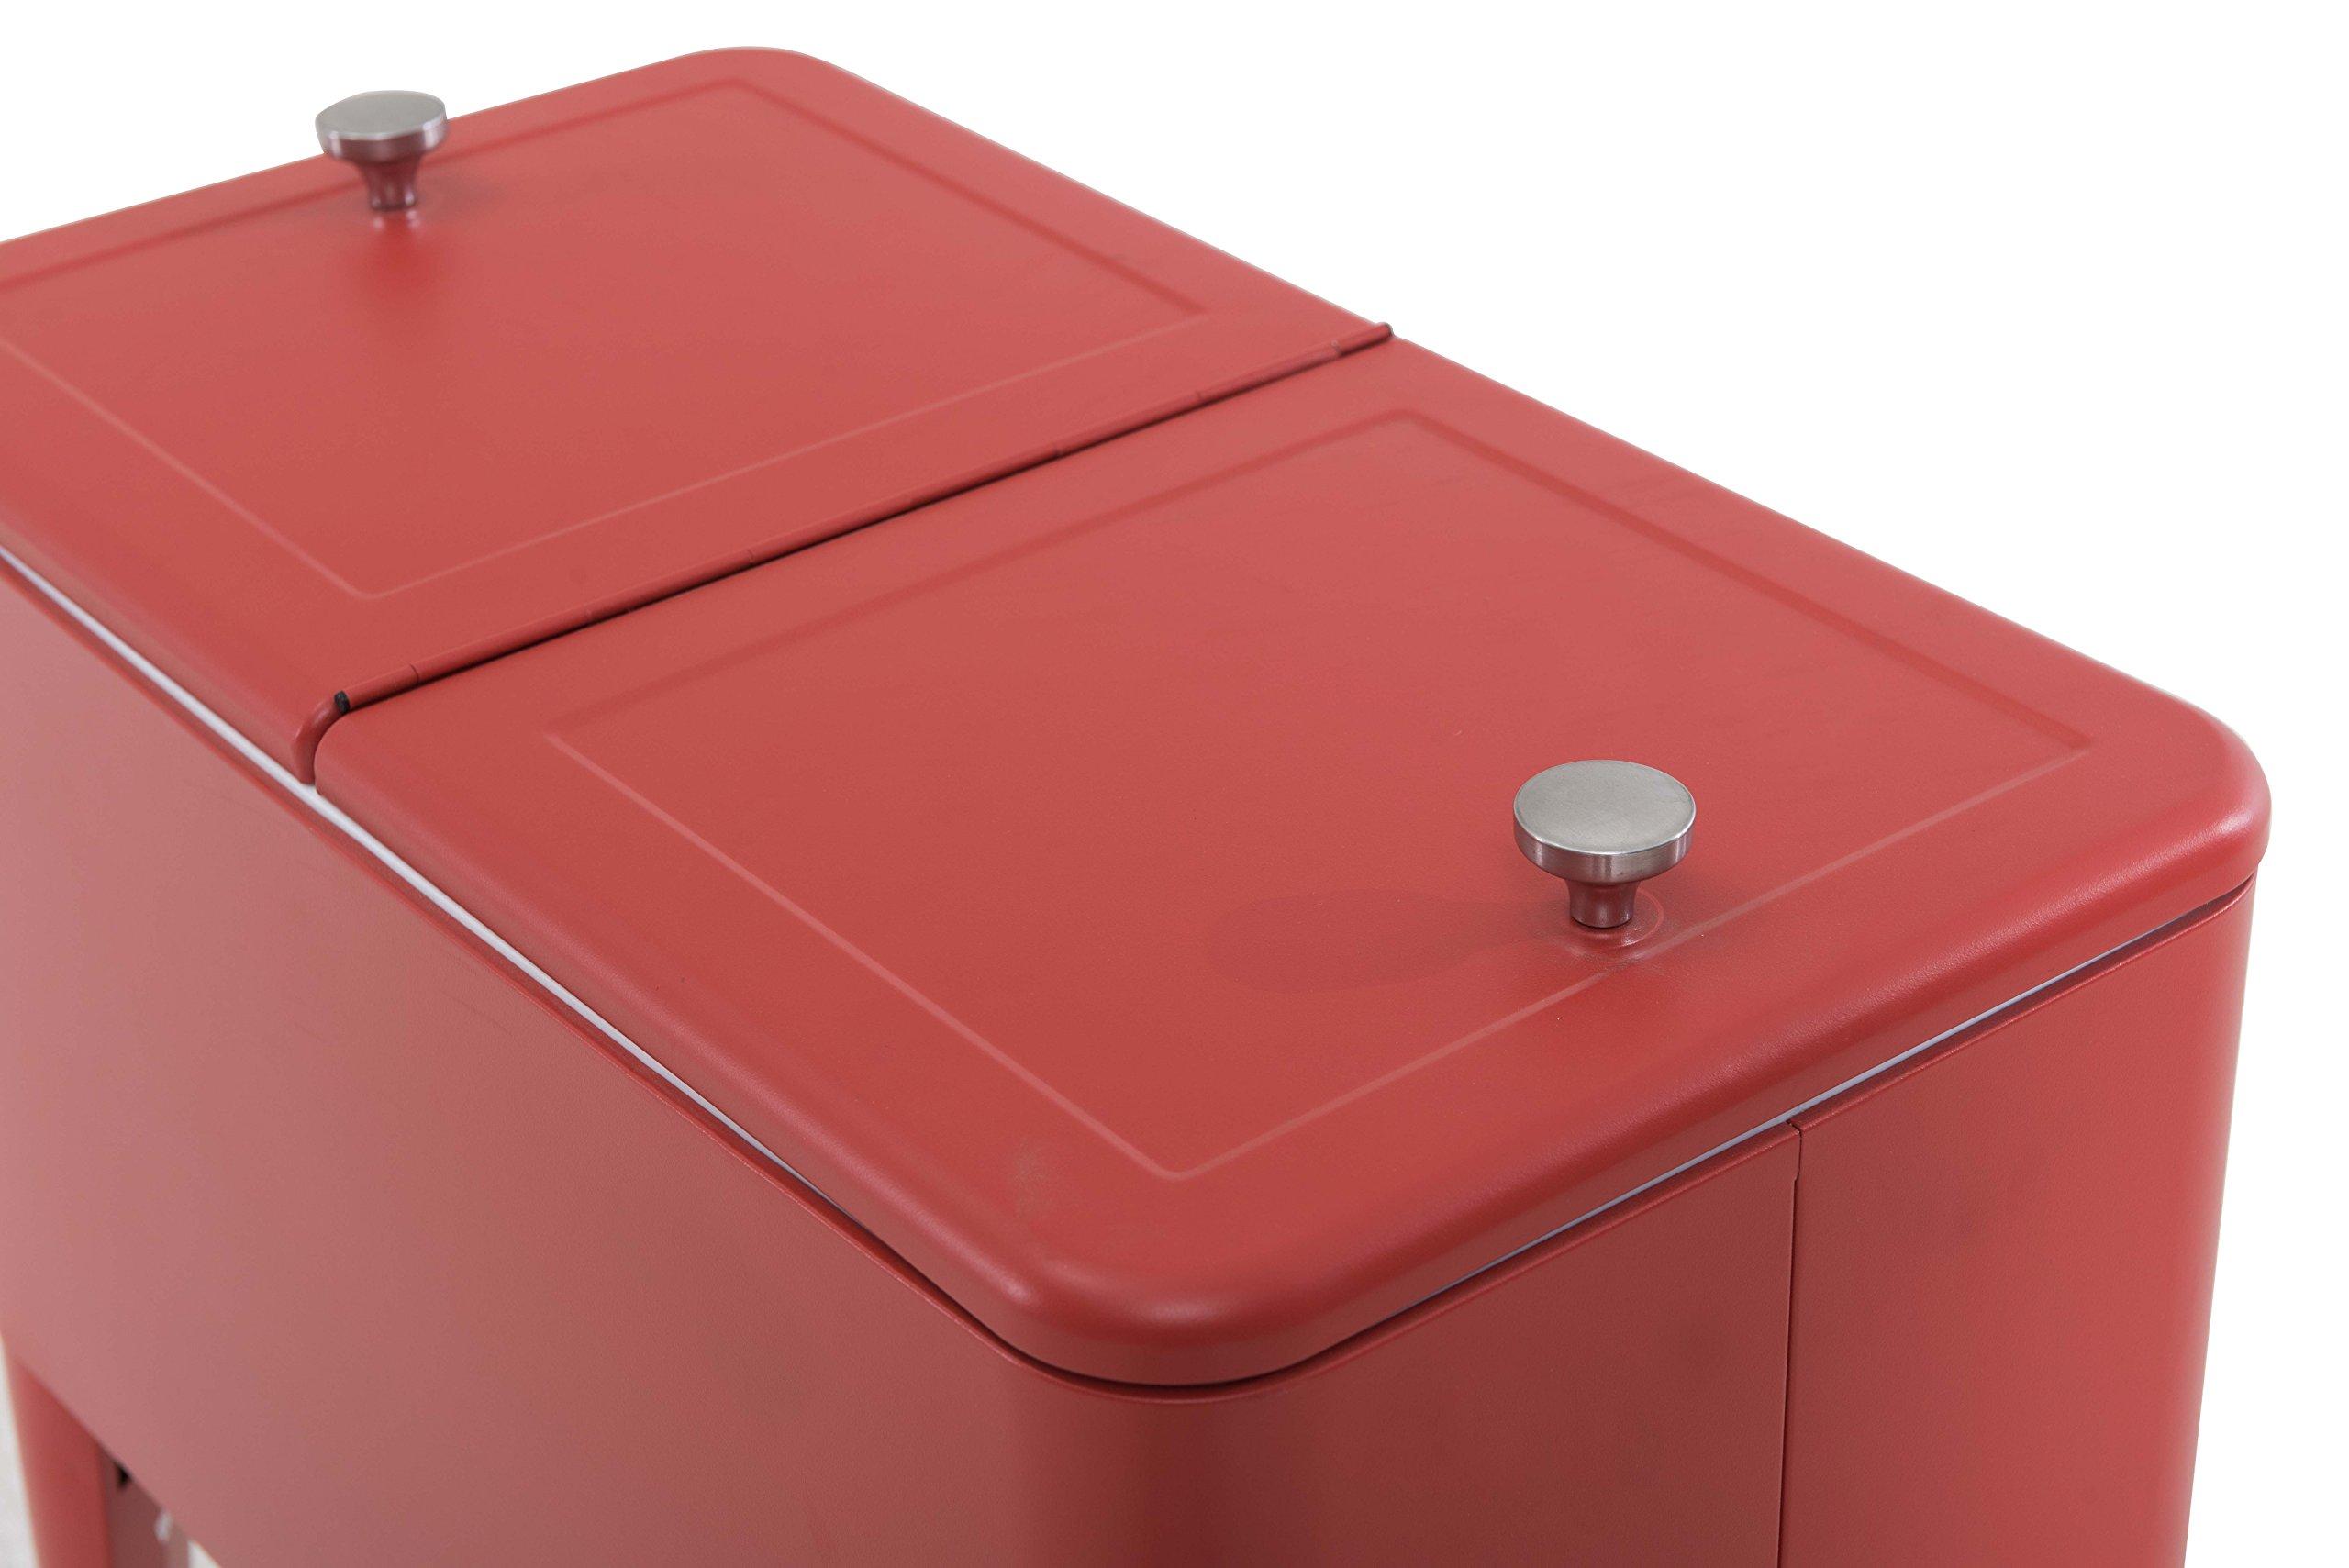 Sunjoy L-BC153PST 60 quart Wheeled Beverage Cooler in Red by sunjoy (Image #6)